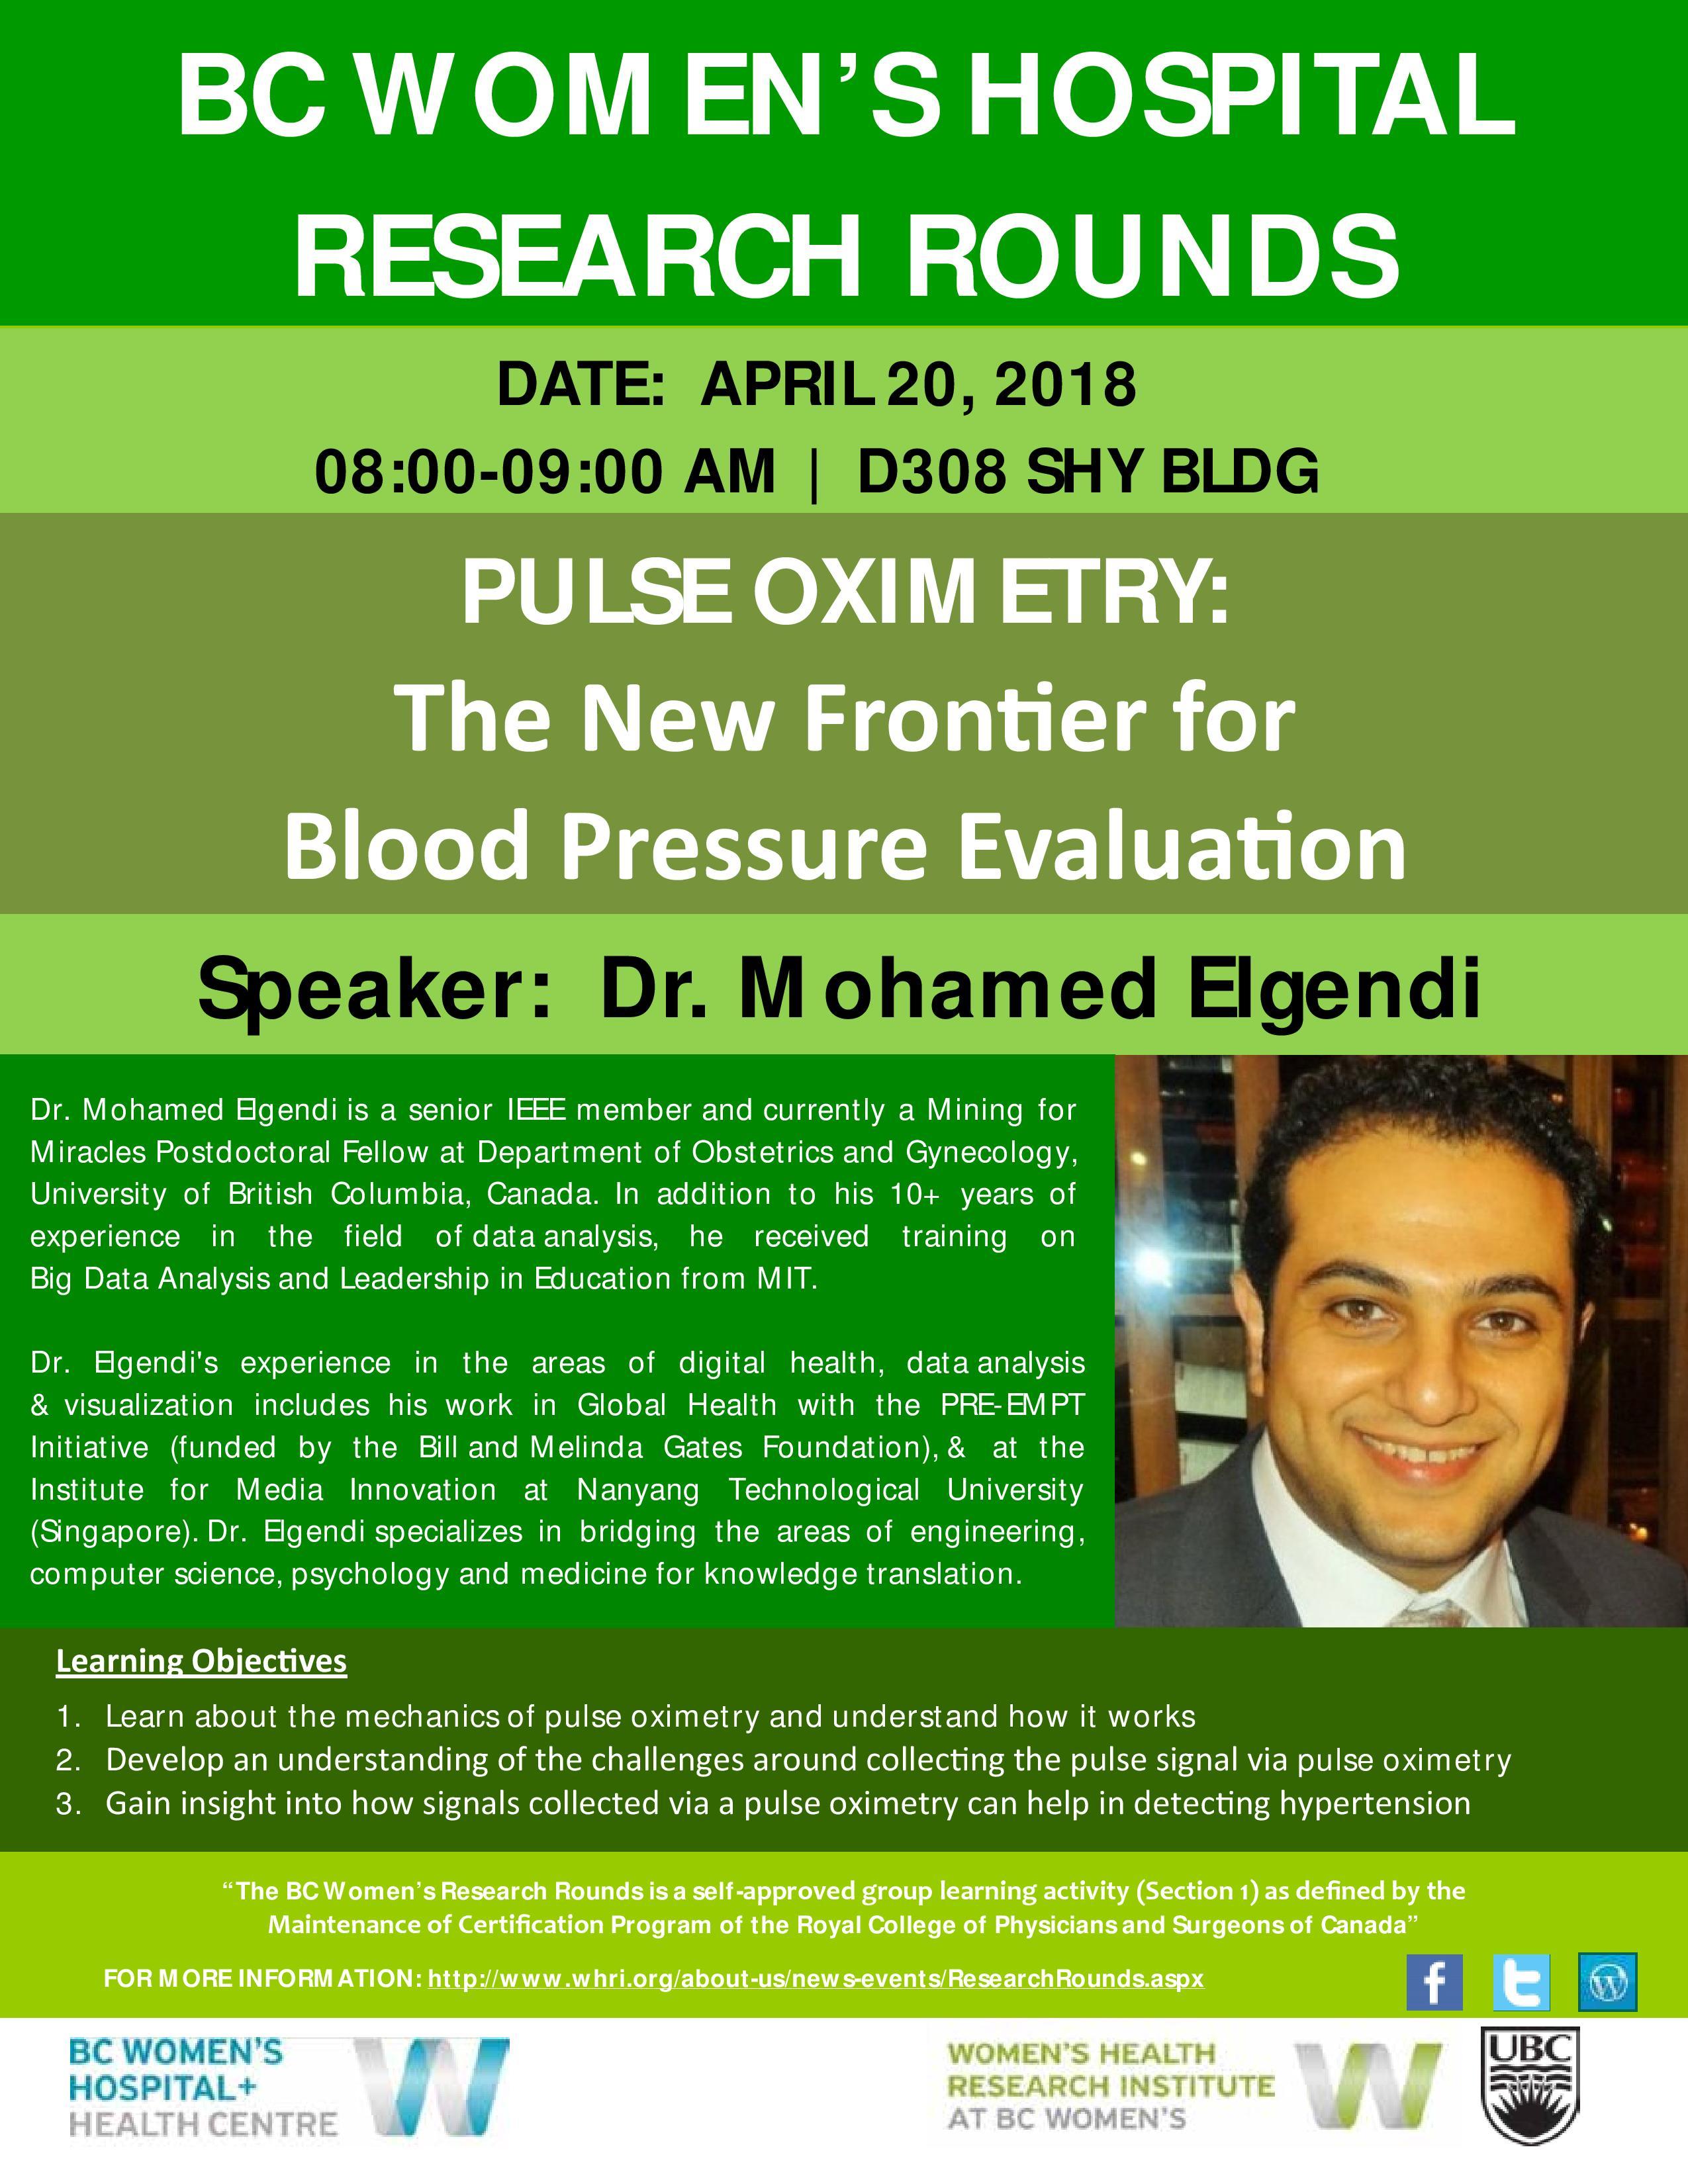 April 20 Rounds Poster featuring Dr. Mohamed Elgendi